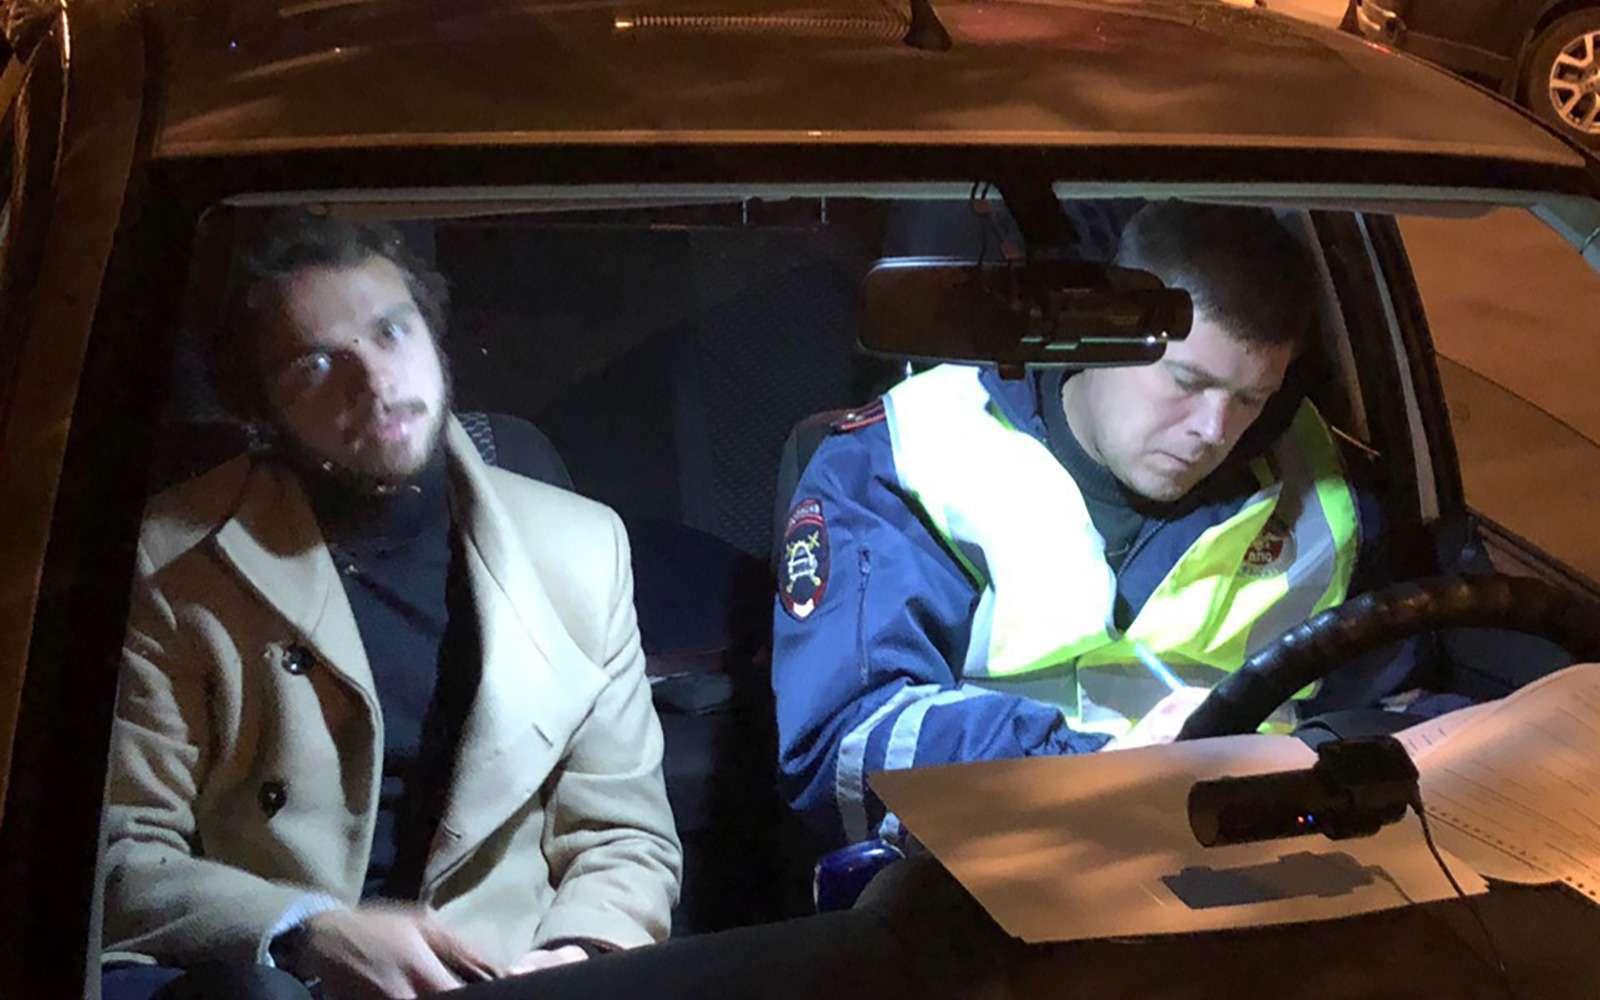 Активисты поймали пьяного футболиста зарулем исдали его вГИБДД— фото 913998